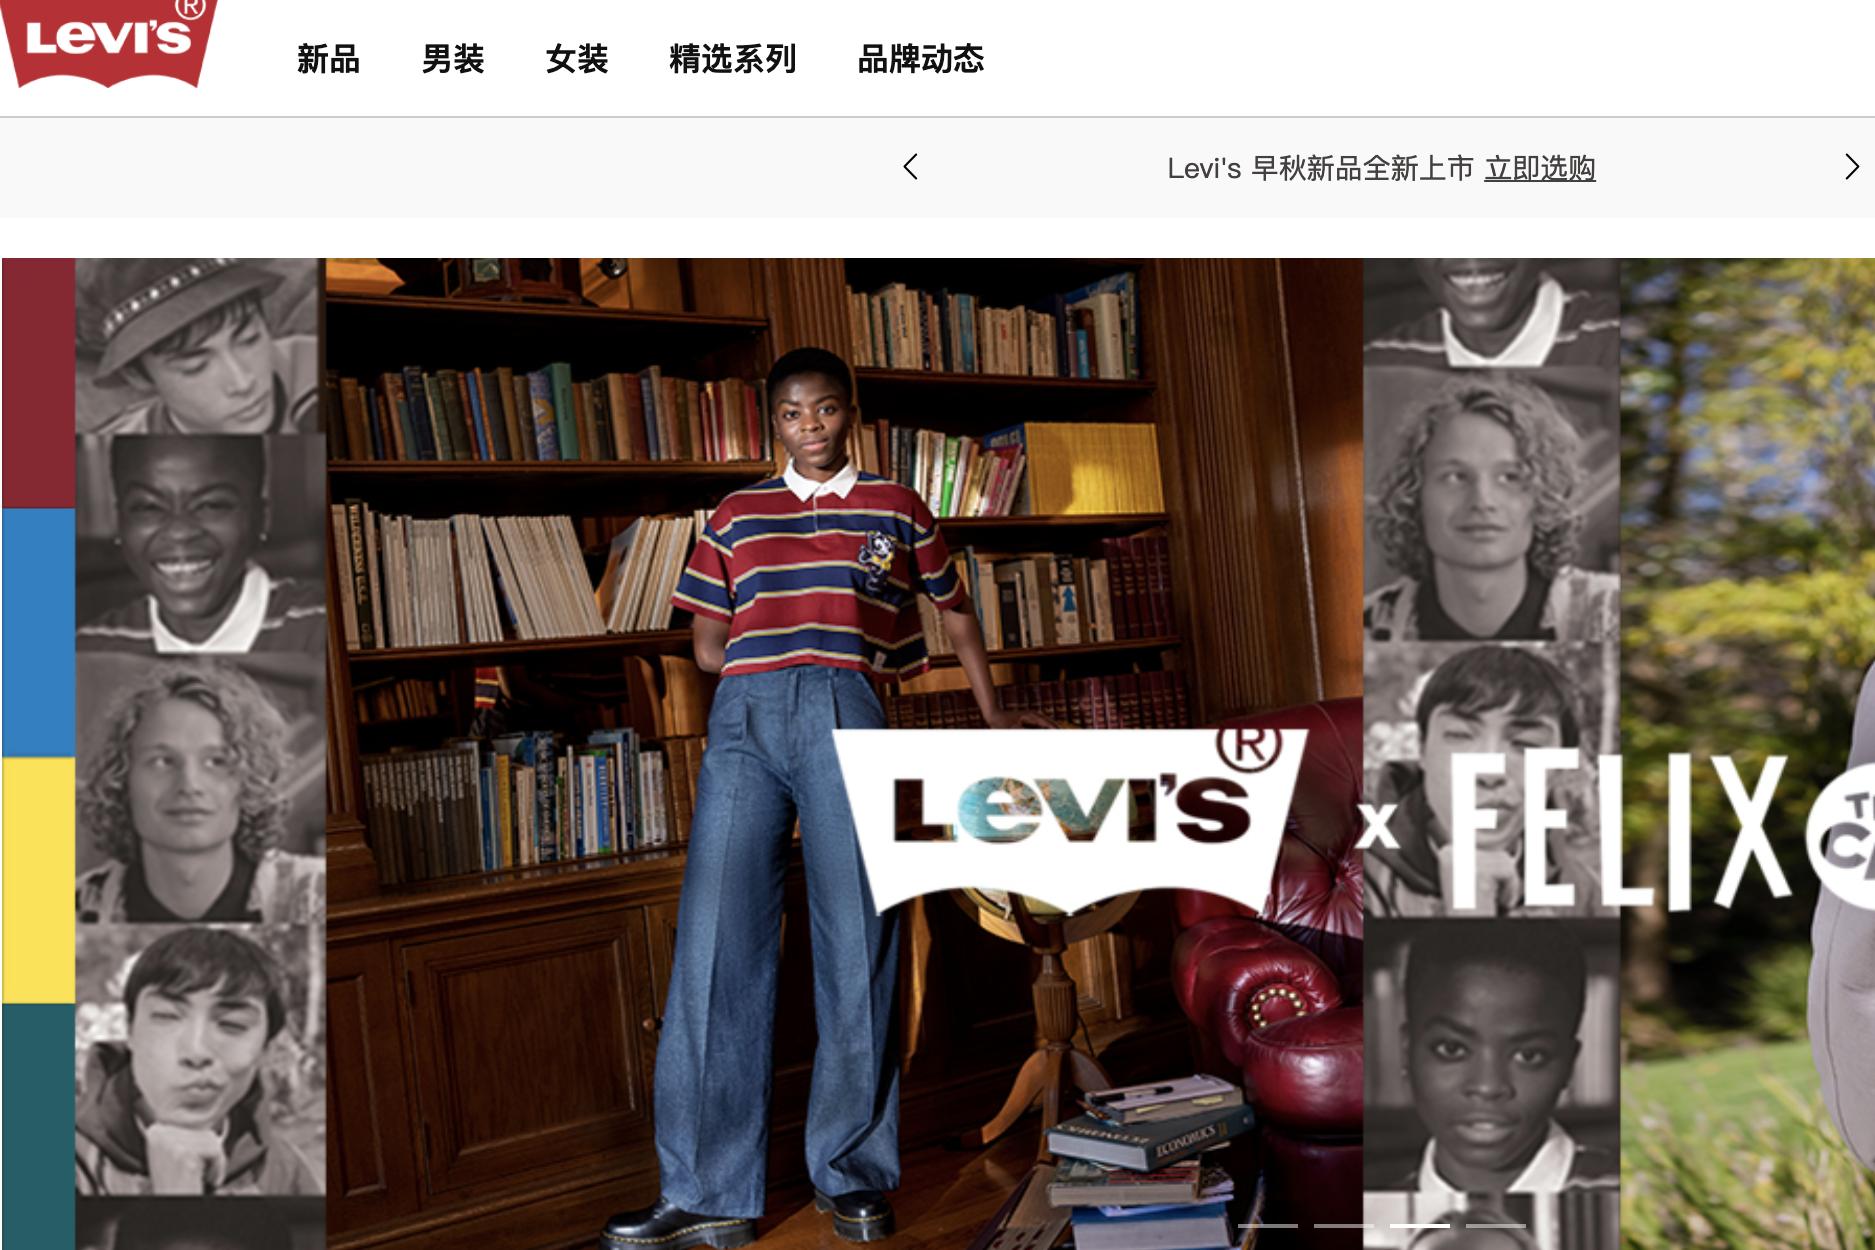 Levi's 最新季度业绩超越疫情前水平达15亿美元